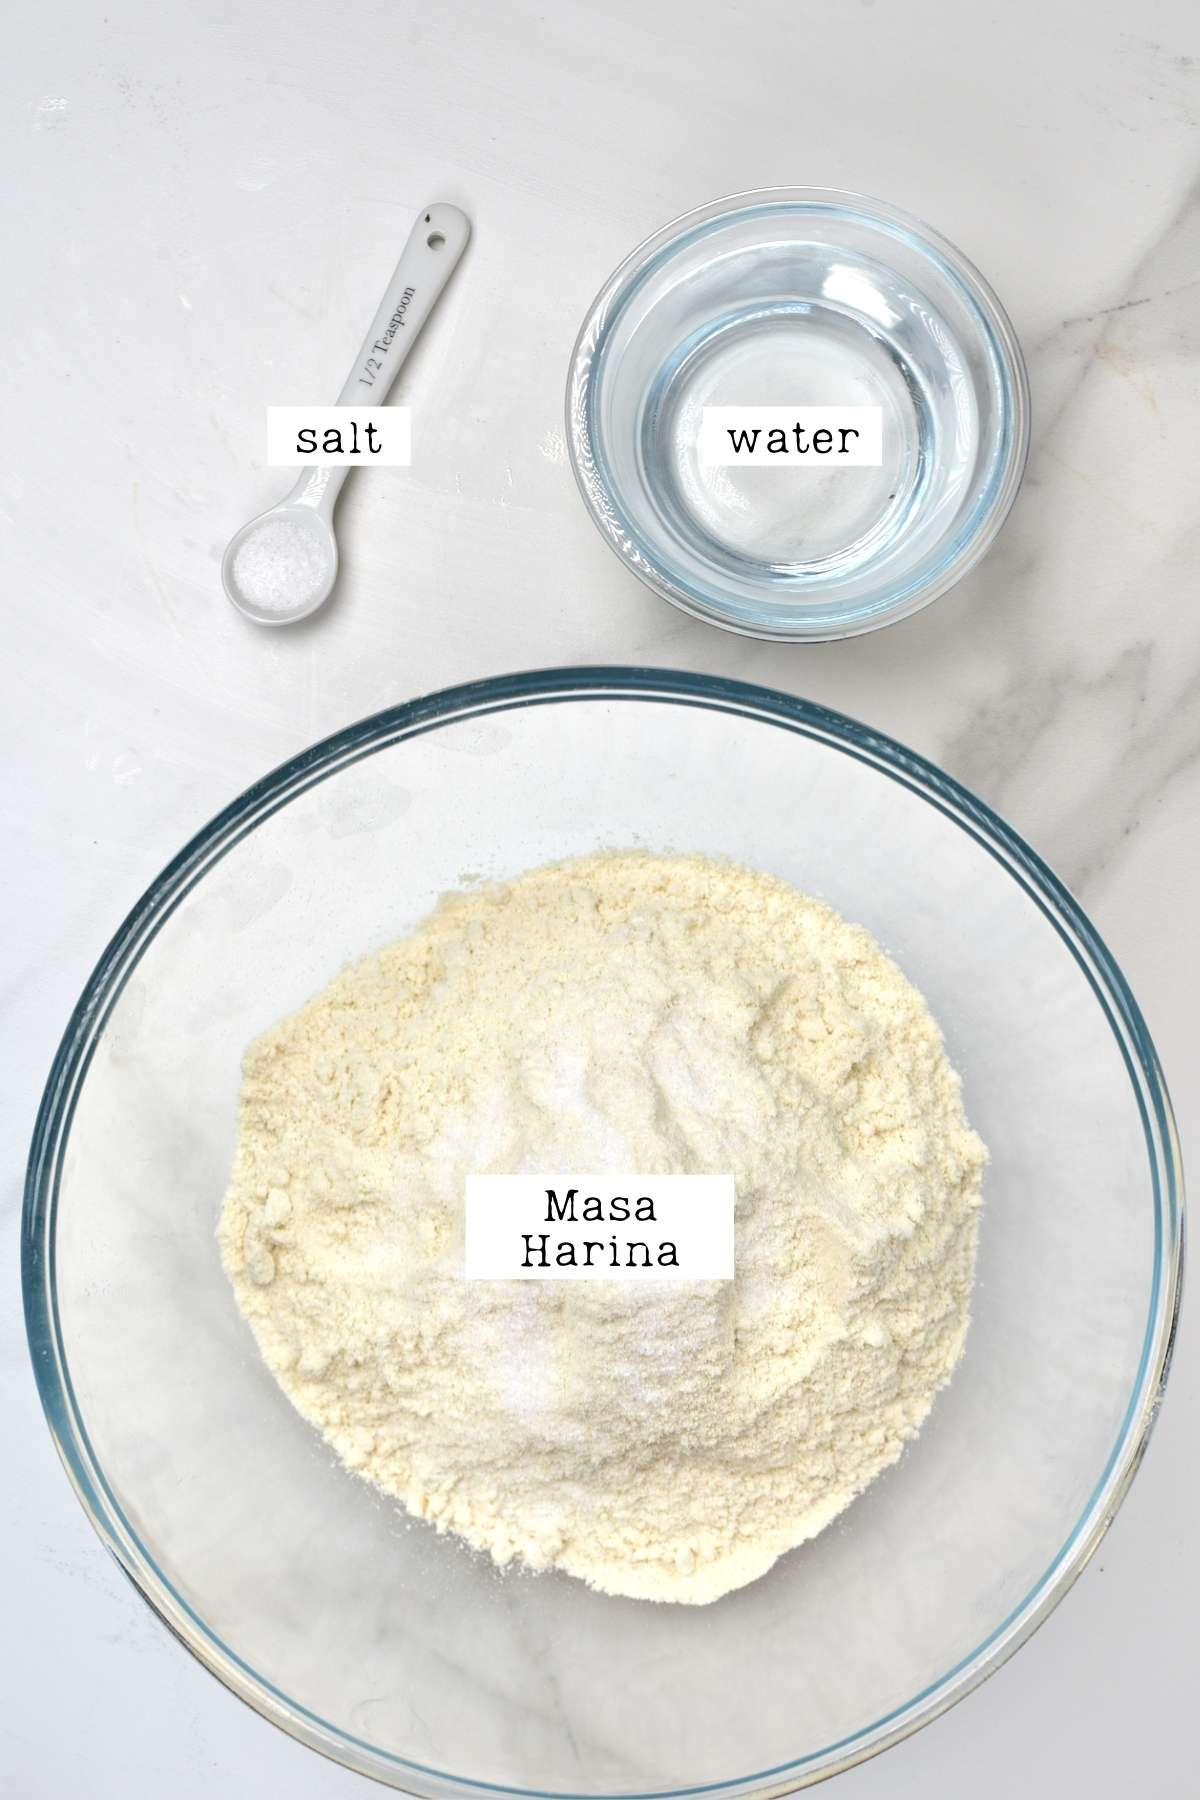 Ingredients for corn tortilla